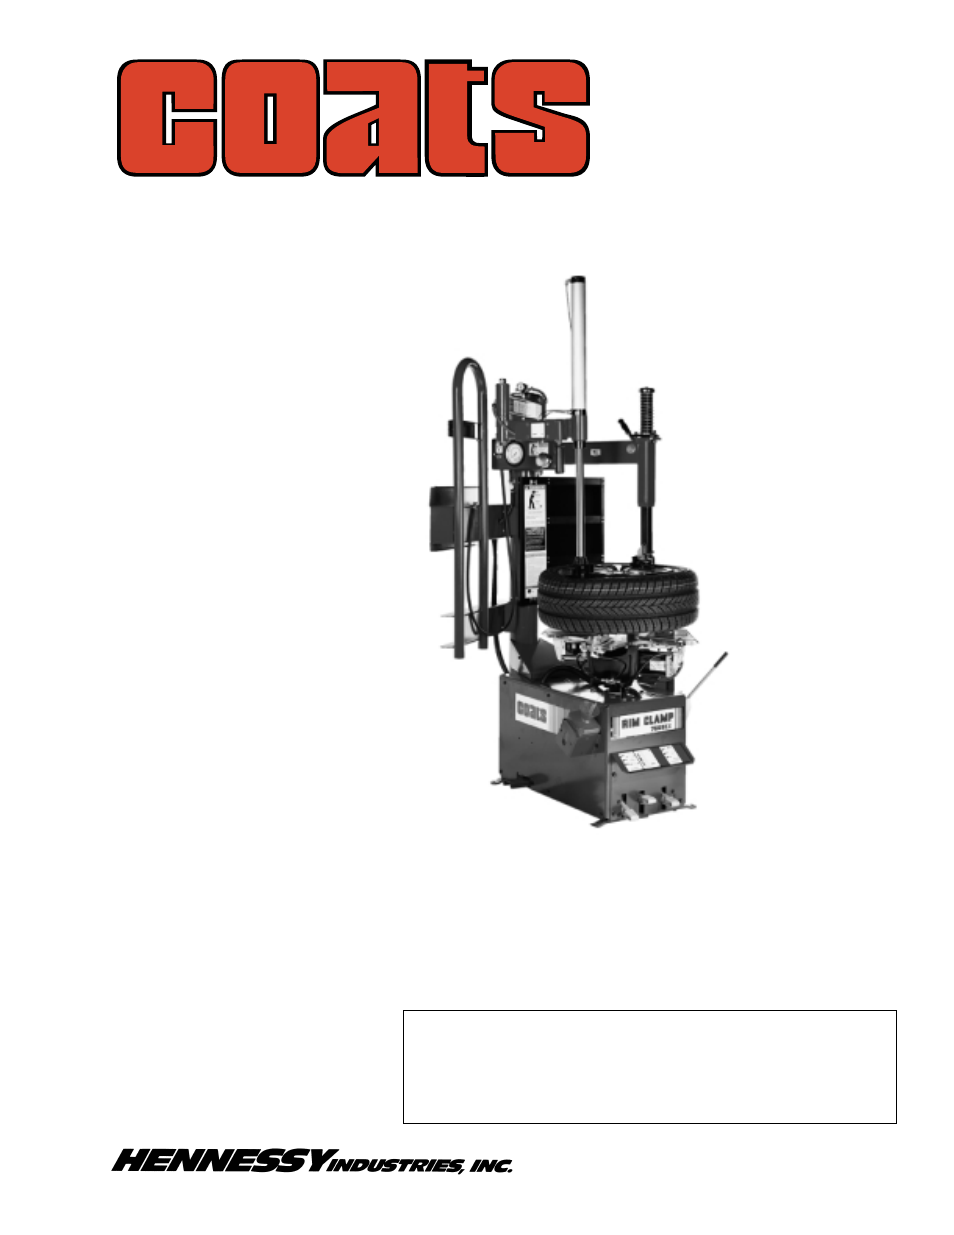 coats 6065 a e ax ex tire changer user manual 20 pages rh manualsdir com harbor freight manual tire changer instructions manual tire changer instruction manuals